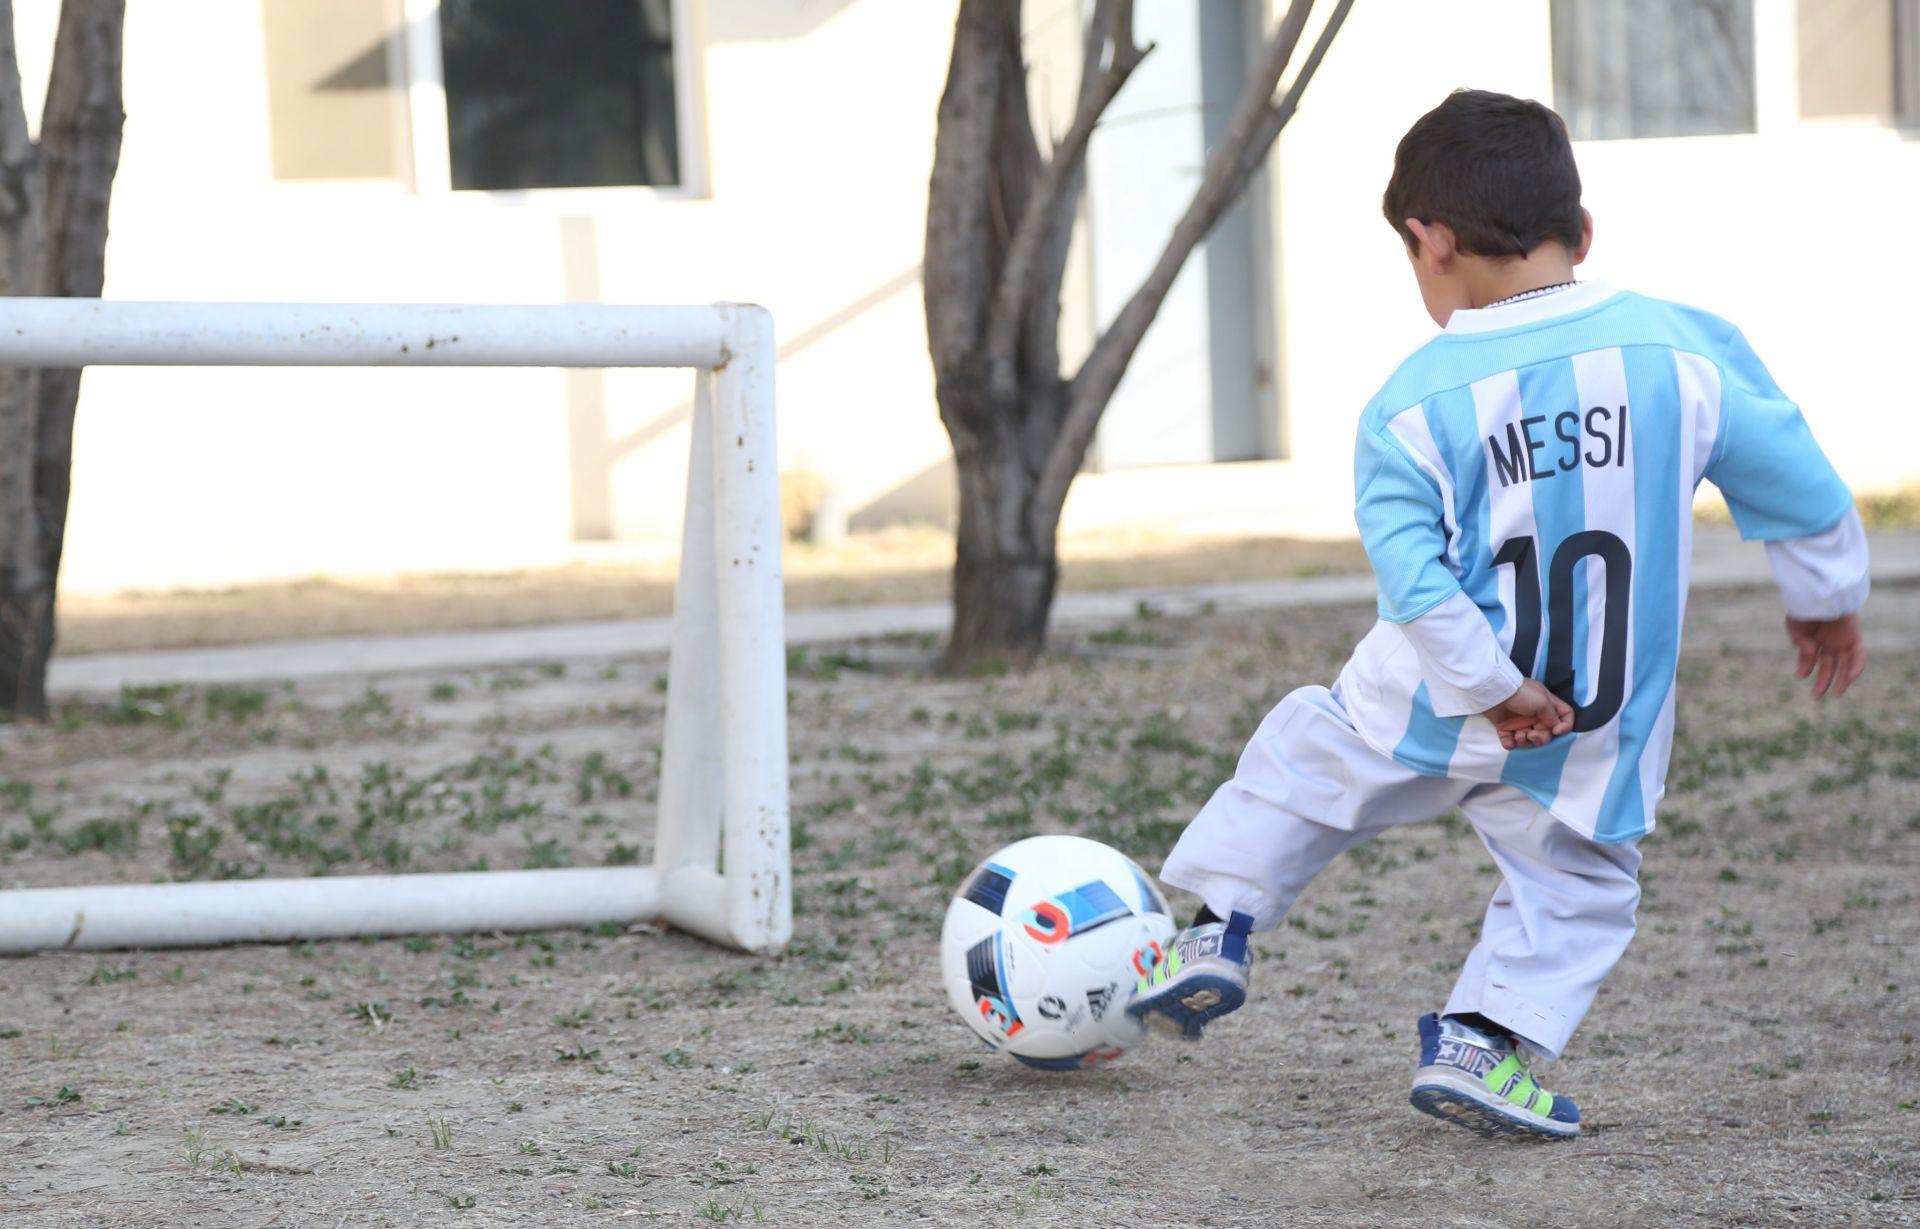 FOTO: UNICEF 'Mali Messi' iz Afganistana napokon dobio pravi argentinski dres